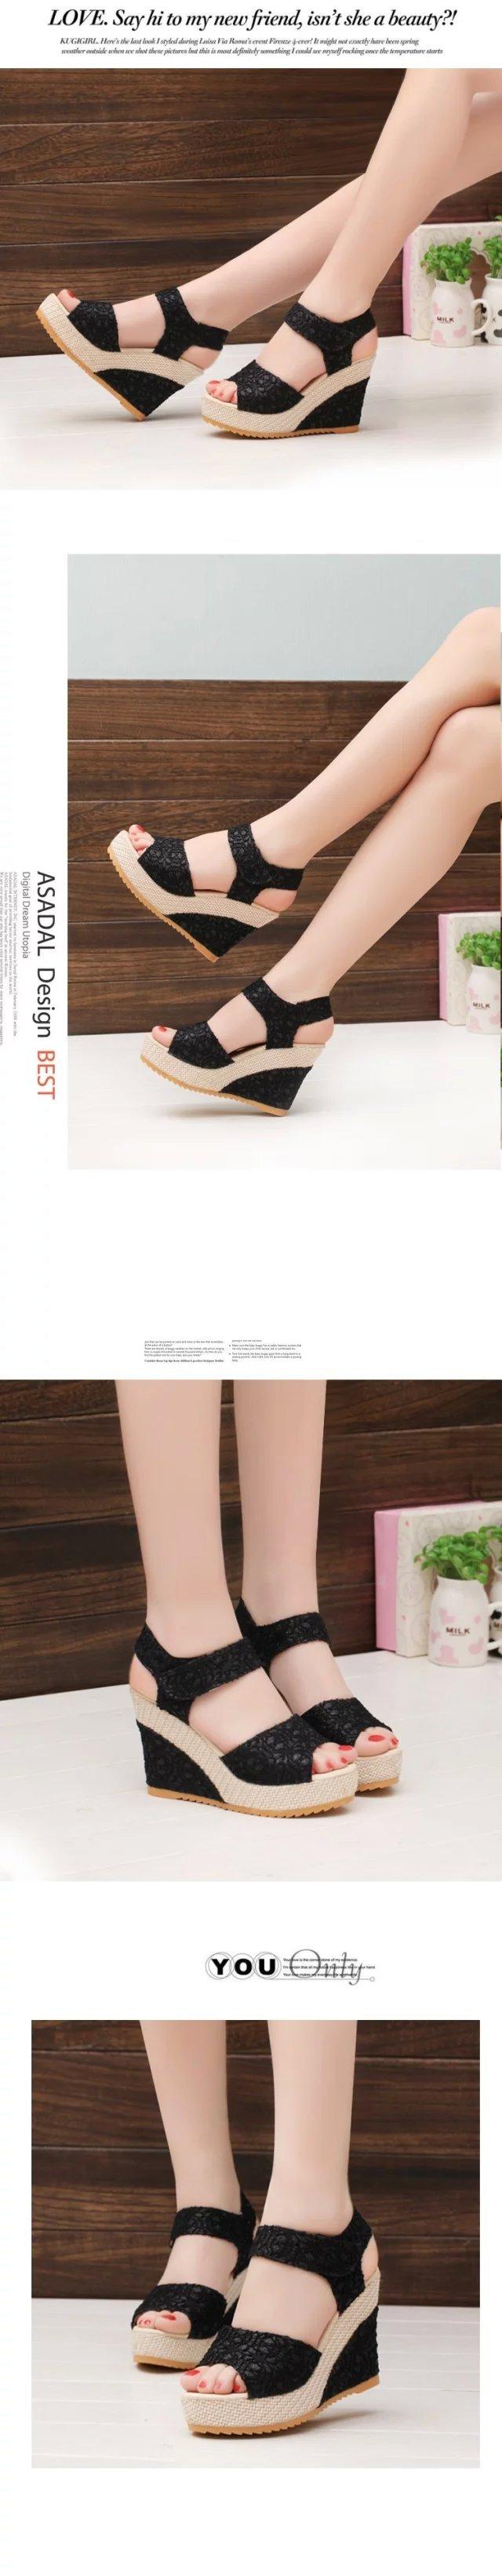 bf9097a2c473 2018 Summer Women Sandals Fashion Bohemia Platform Women Shoes Female  Footwear Women Casual Shoes YBT570